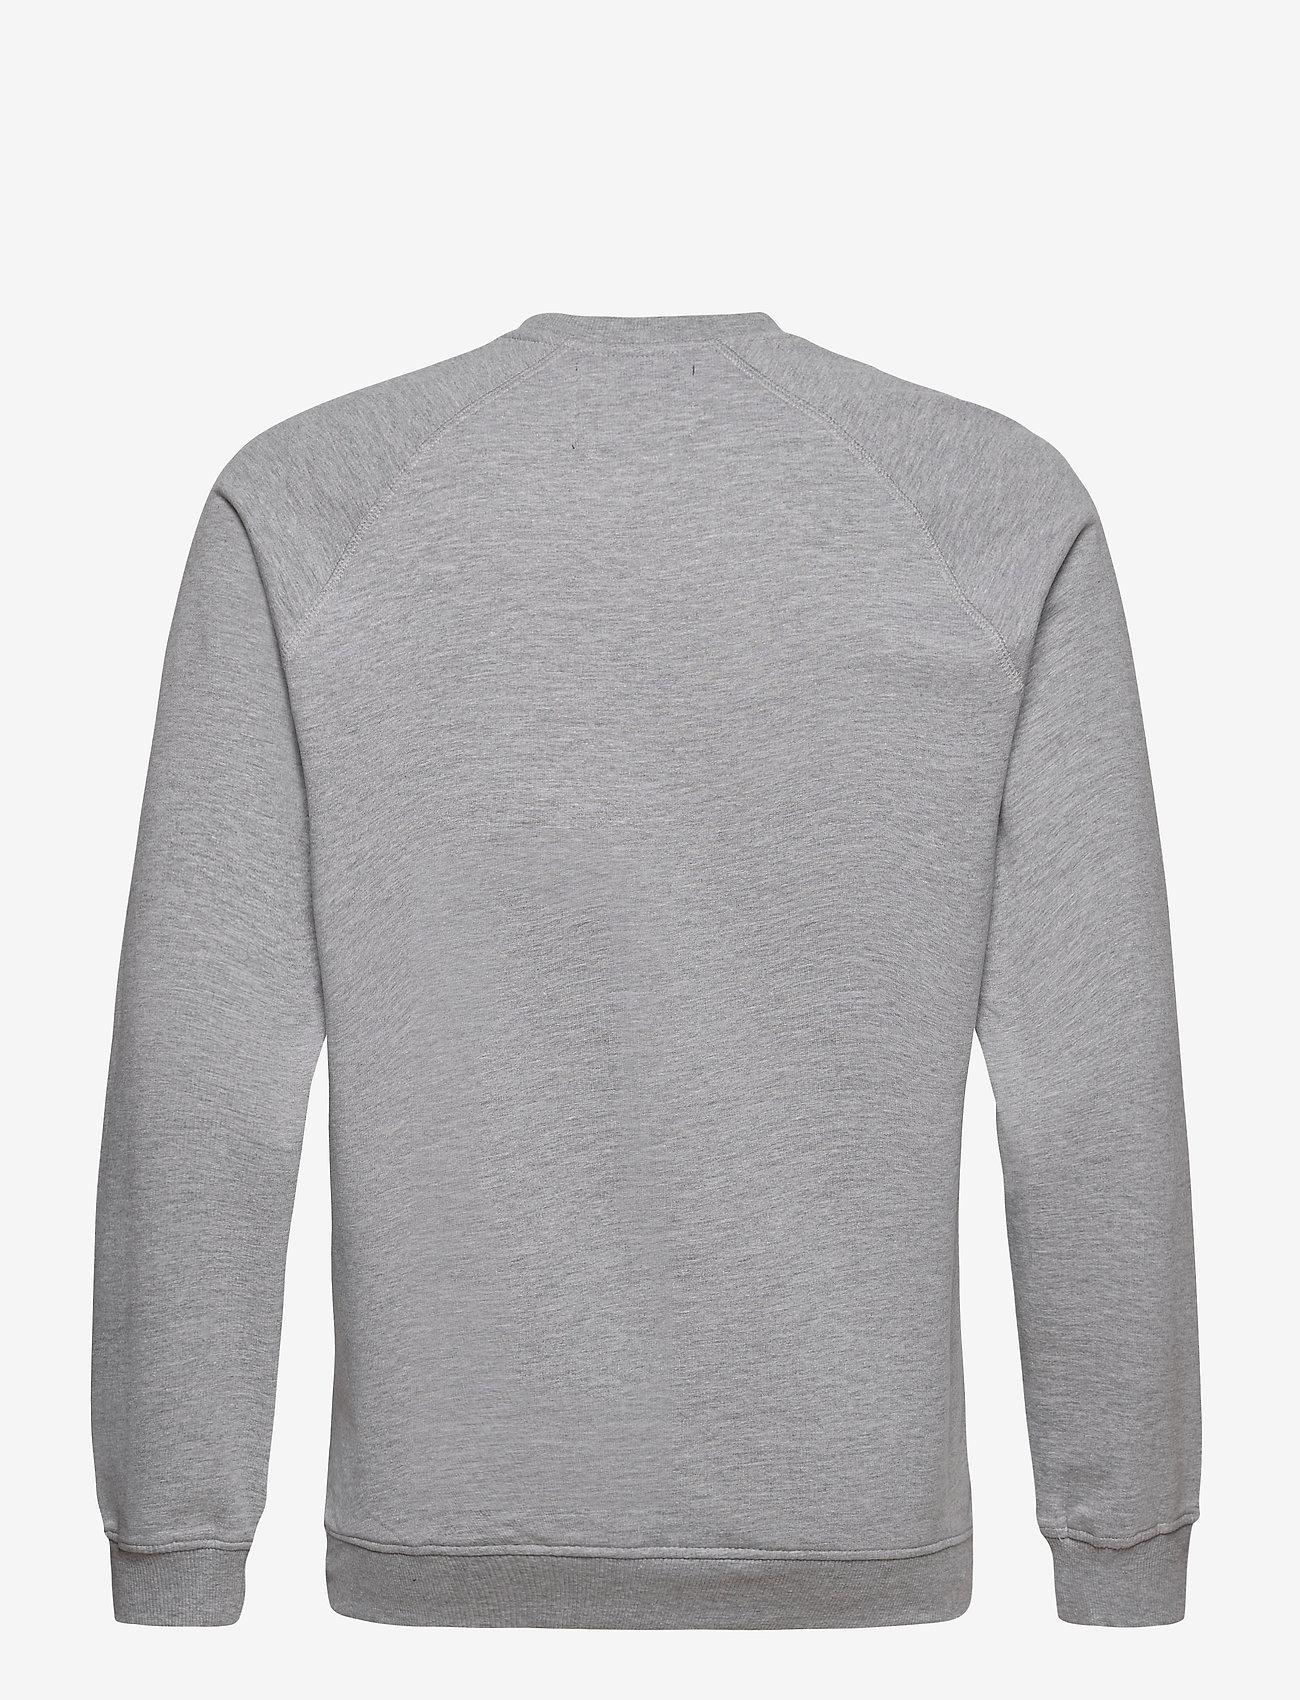 Denim project - BASIC SWEAT CREW - basic sweatshirts - 003 grey - 1